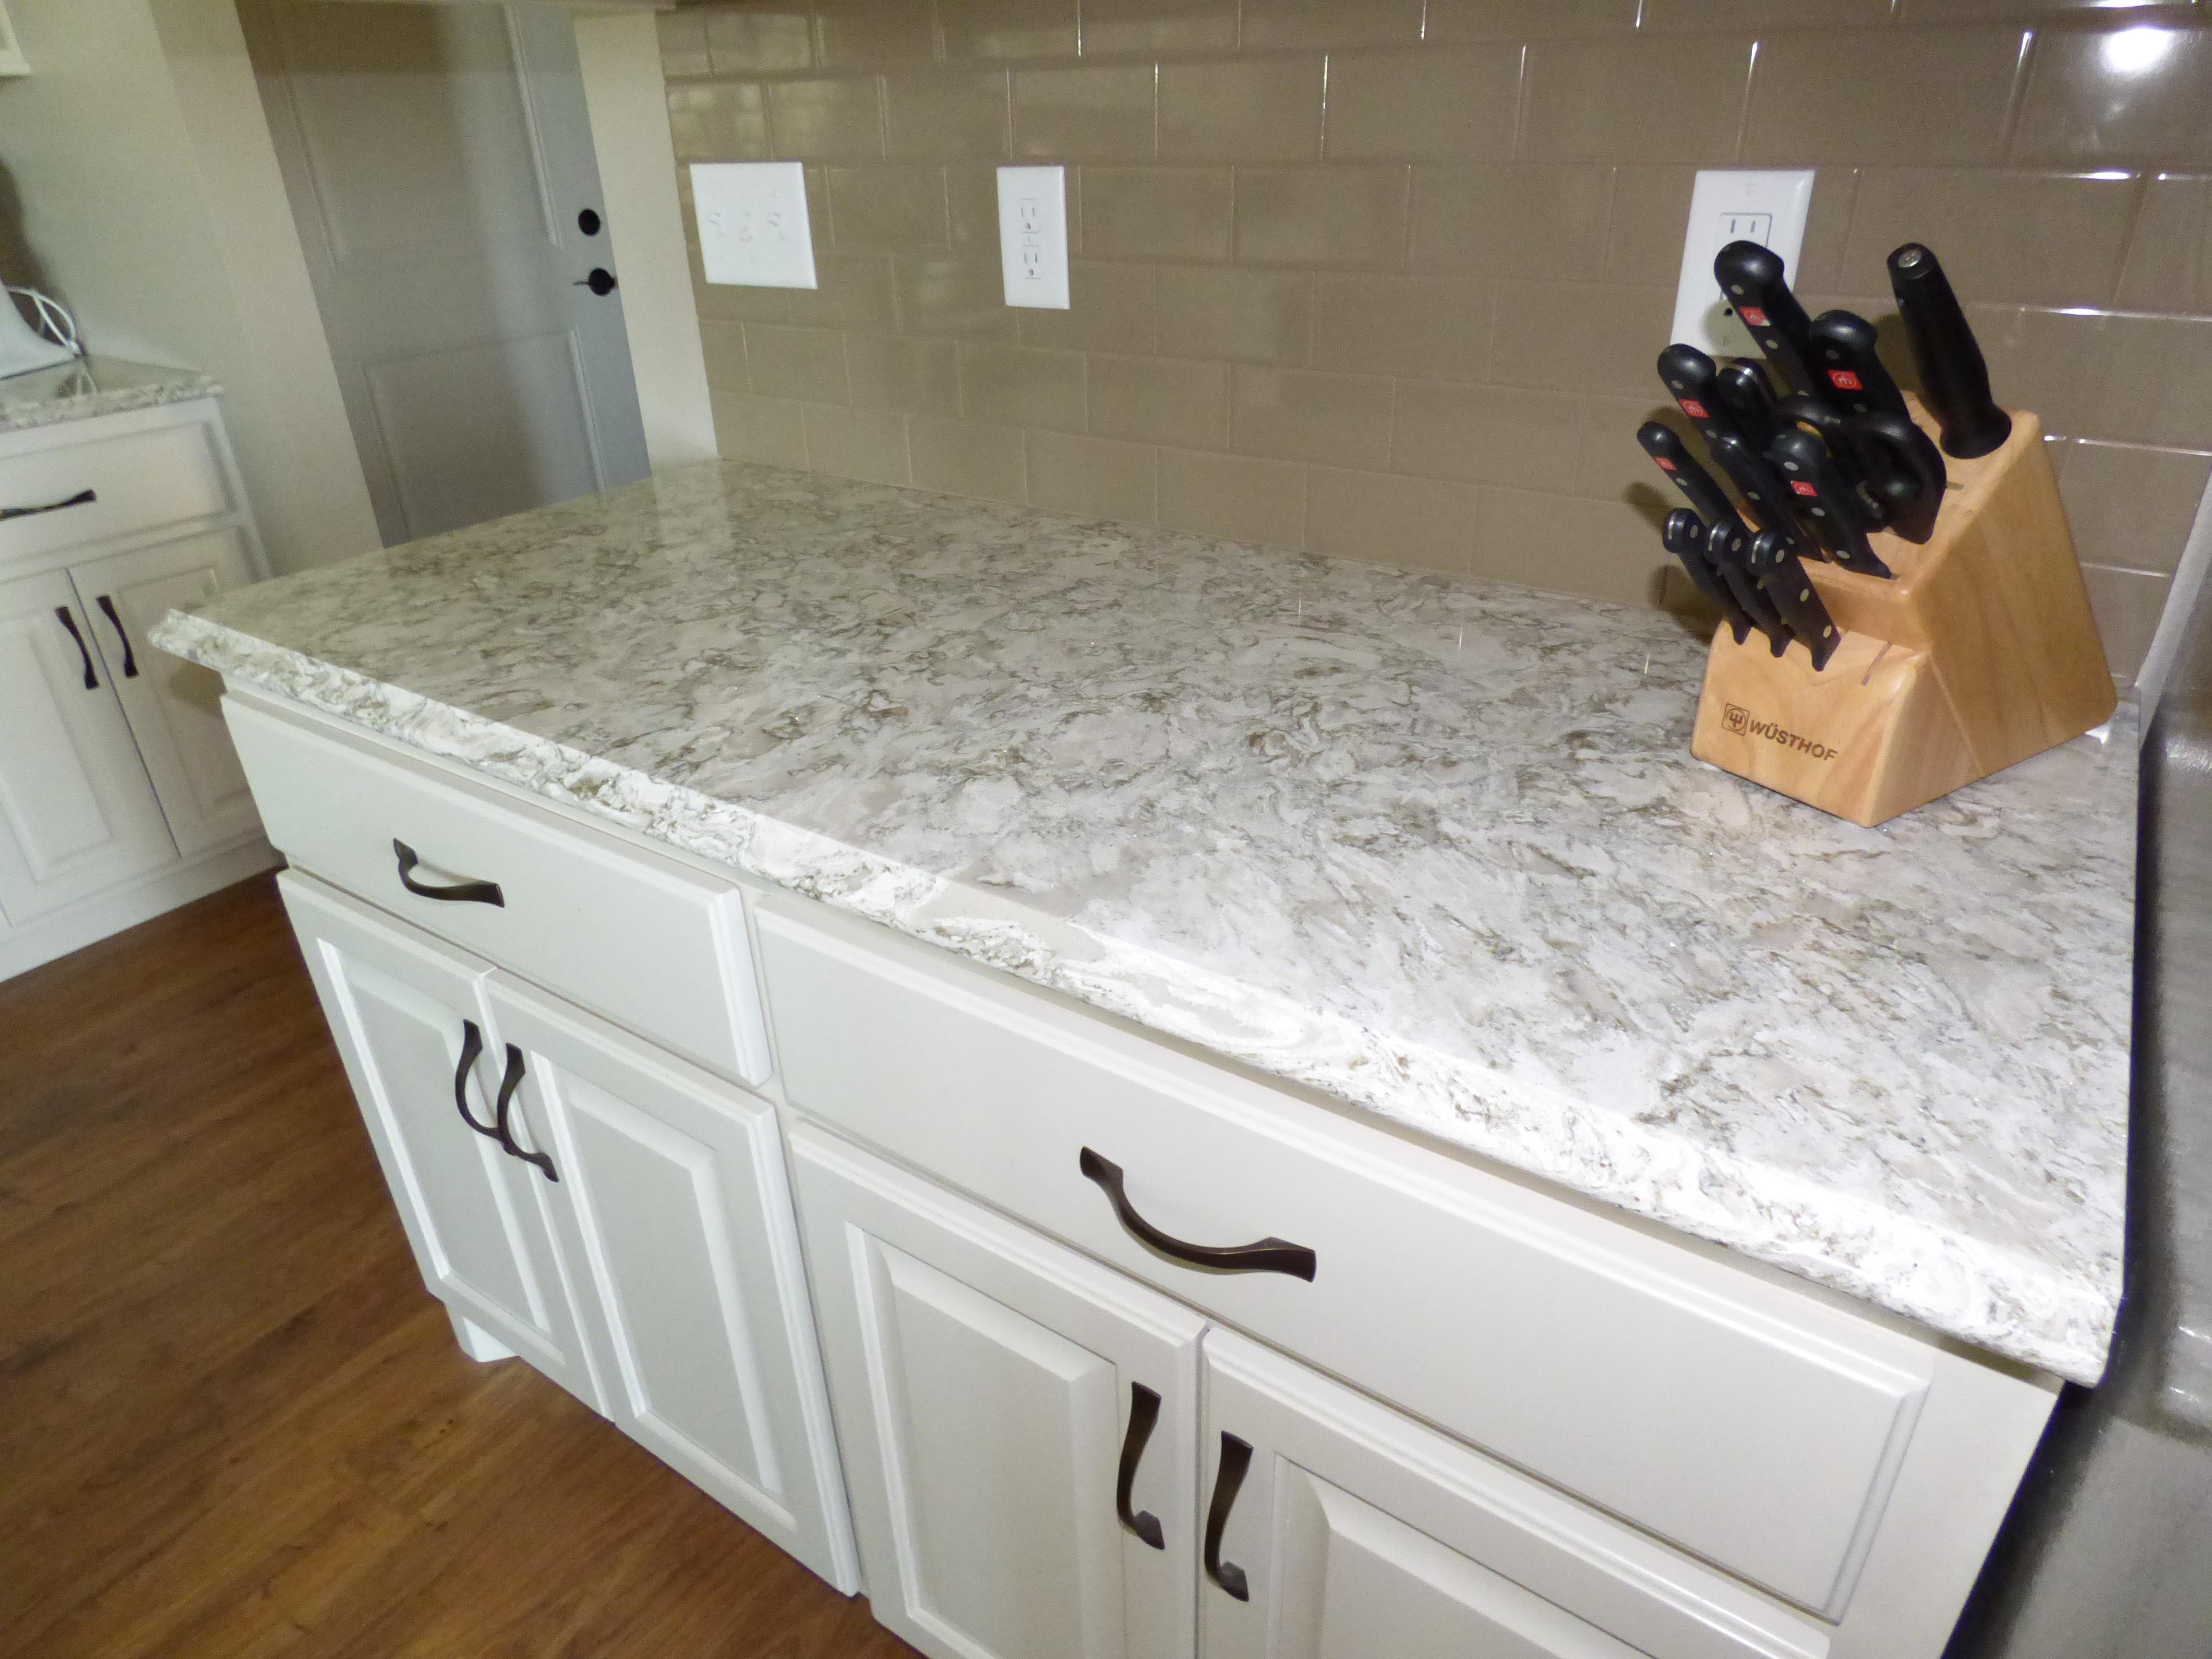 surfaces creative darlington marietta cambria quartz blog countertop kitchen soukup countertops